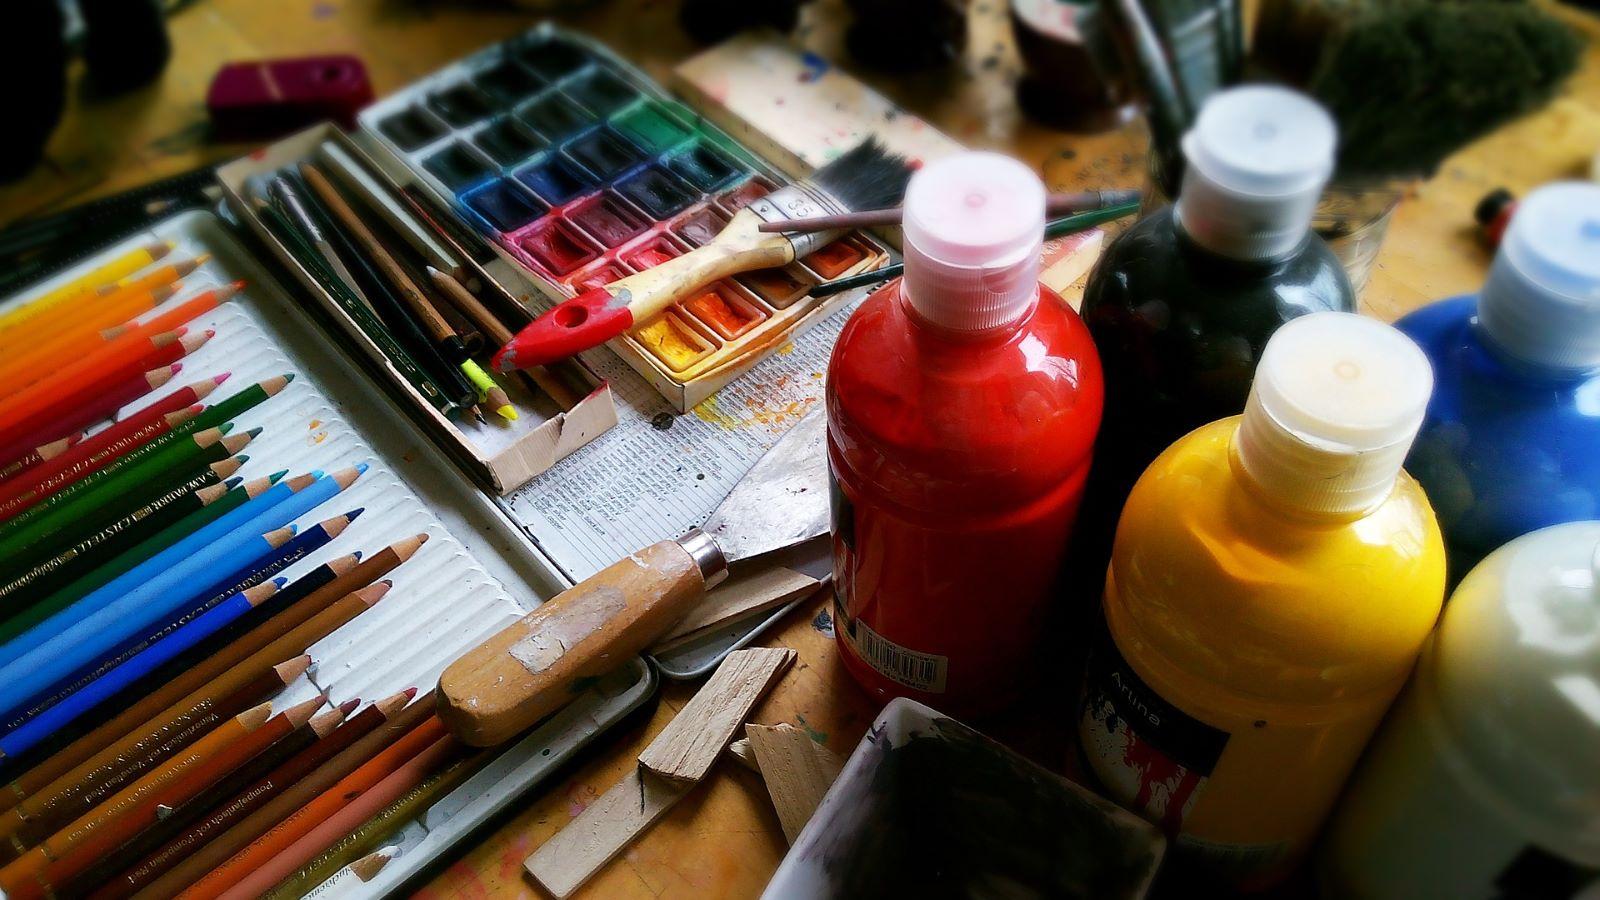 Peinture, pinceaux et crayons